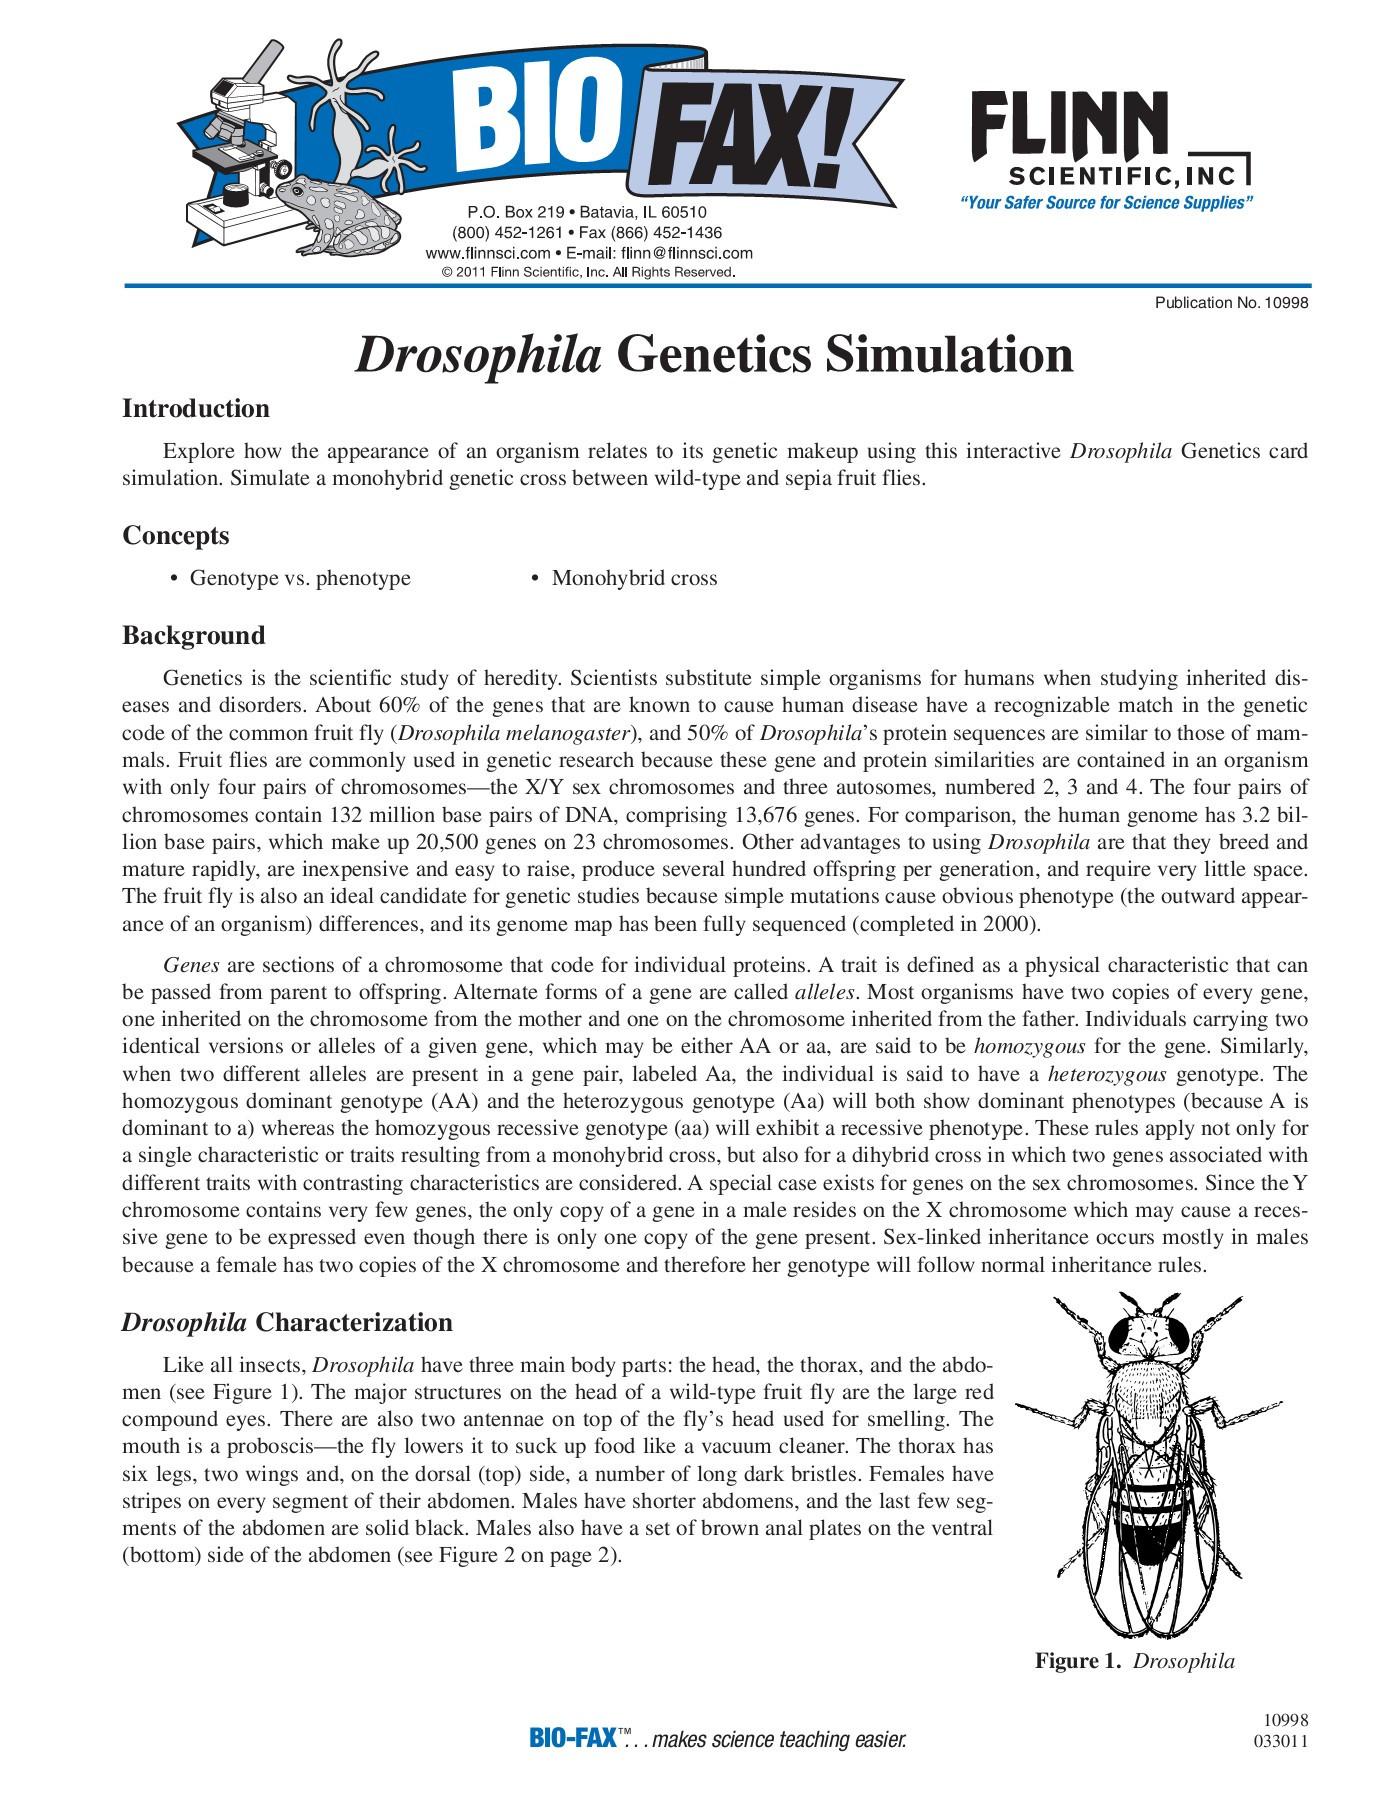 Genetics X Linked Genes Worksheet Drosophila Genetics Simulation Flinn Scientific Pages 1